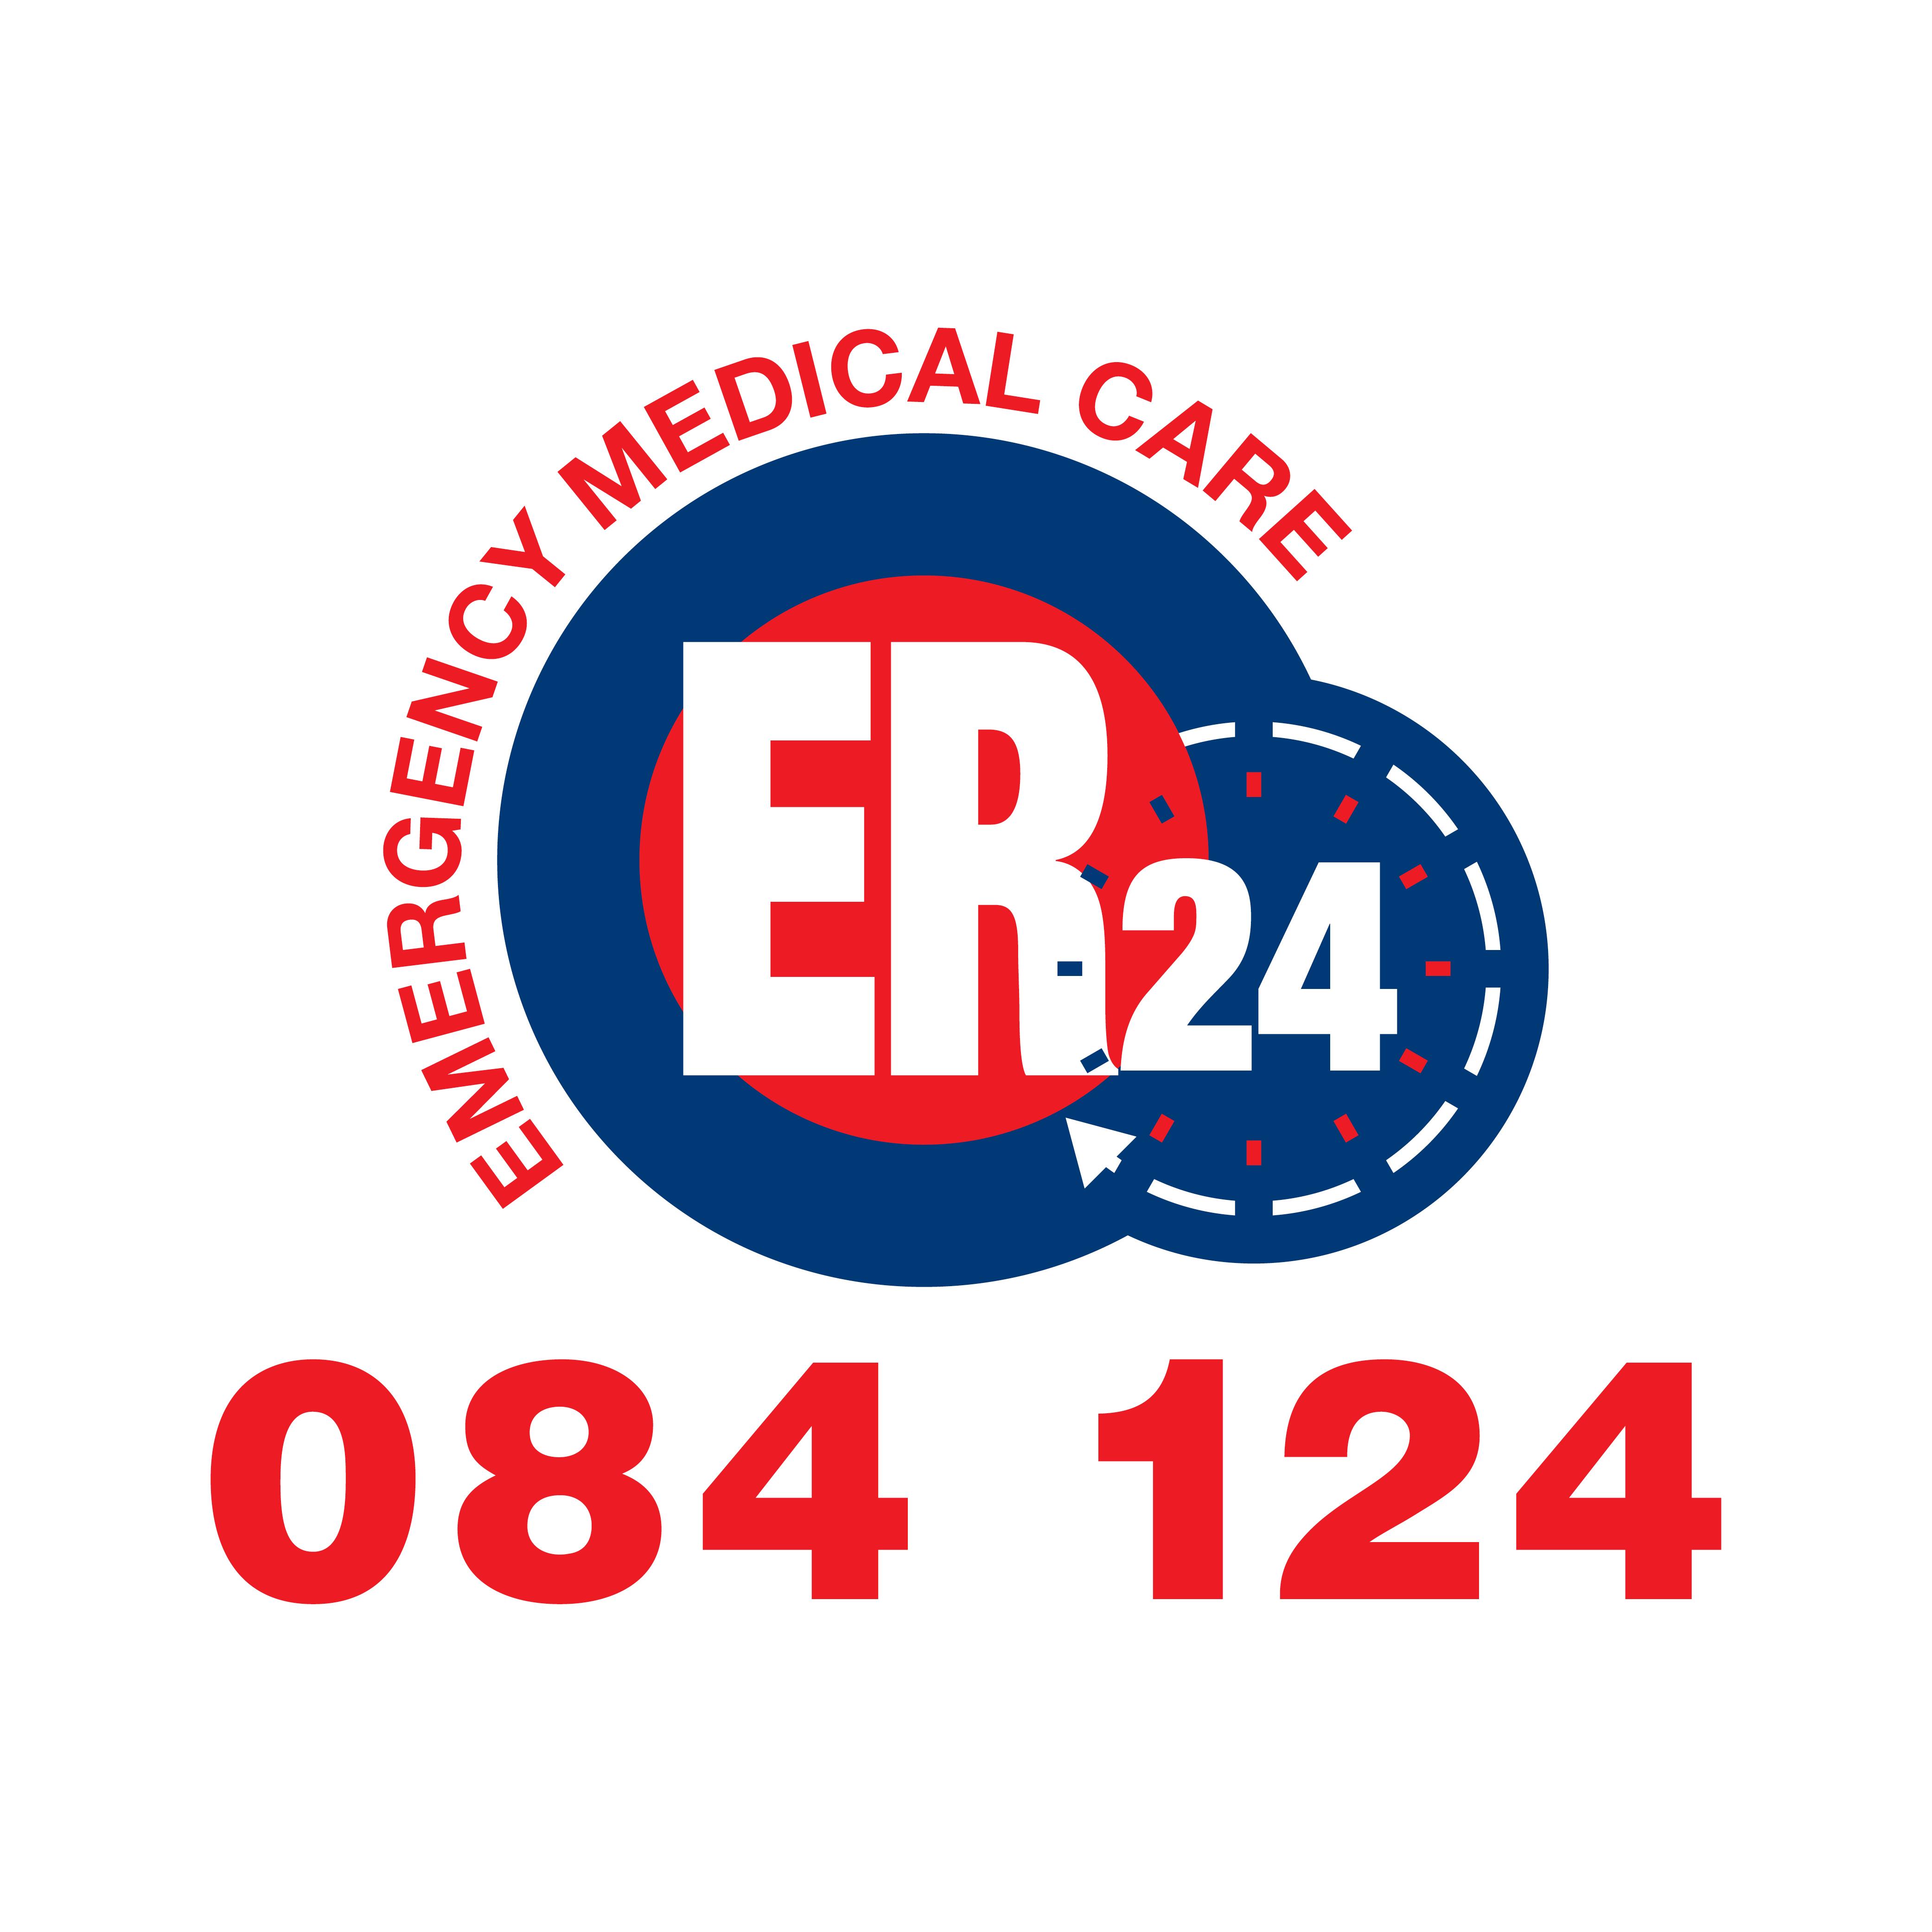 ER24 Highveld